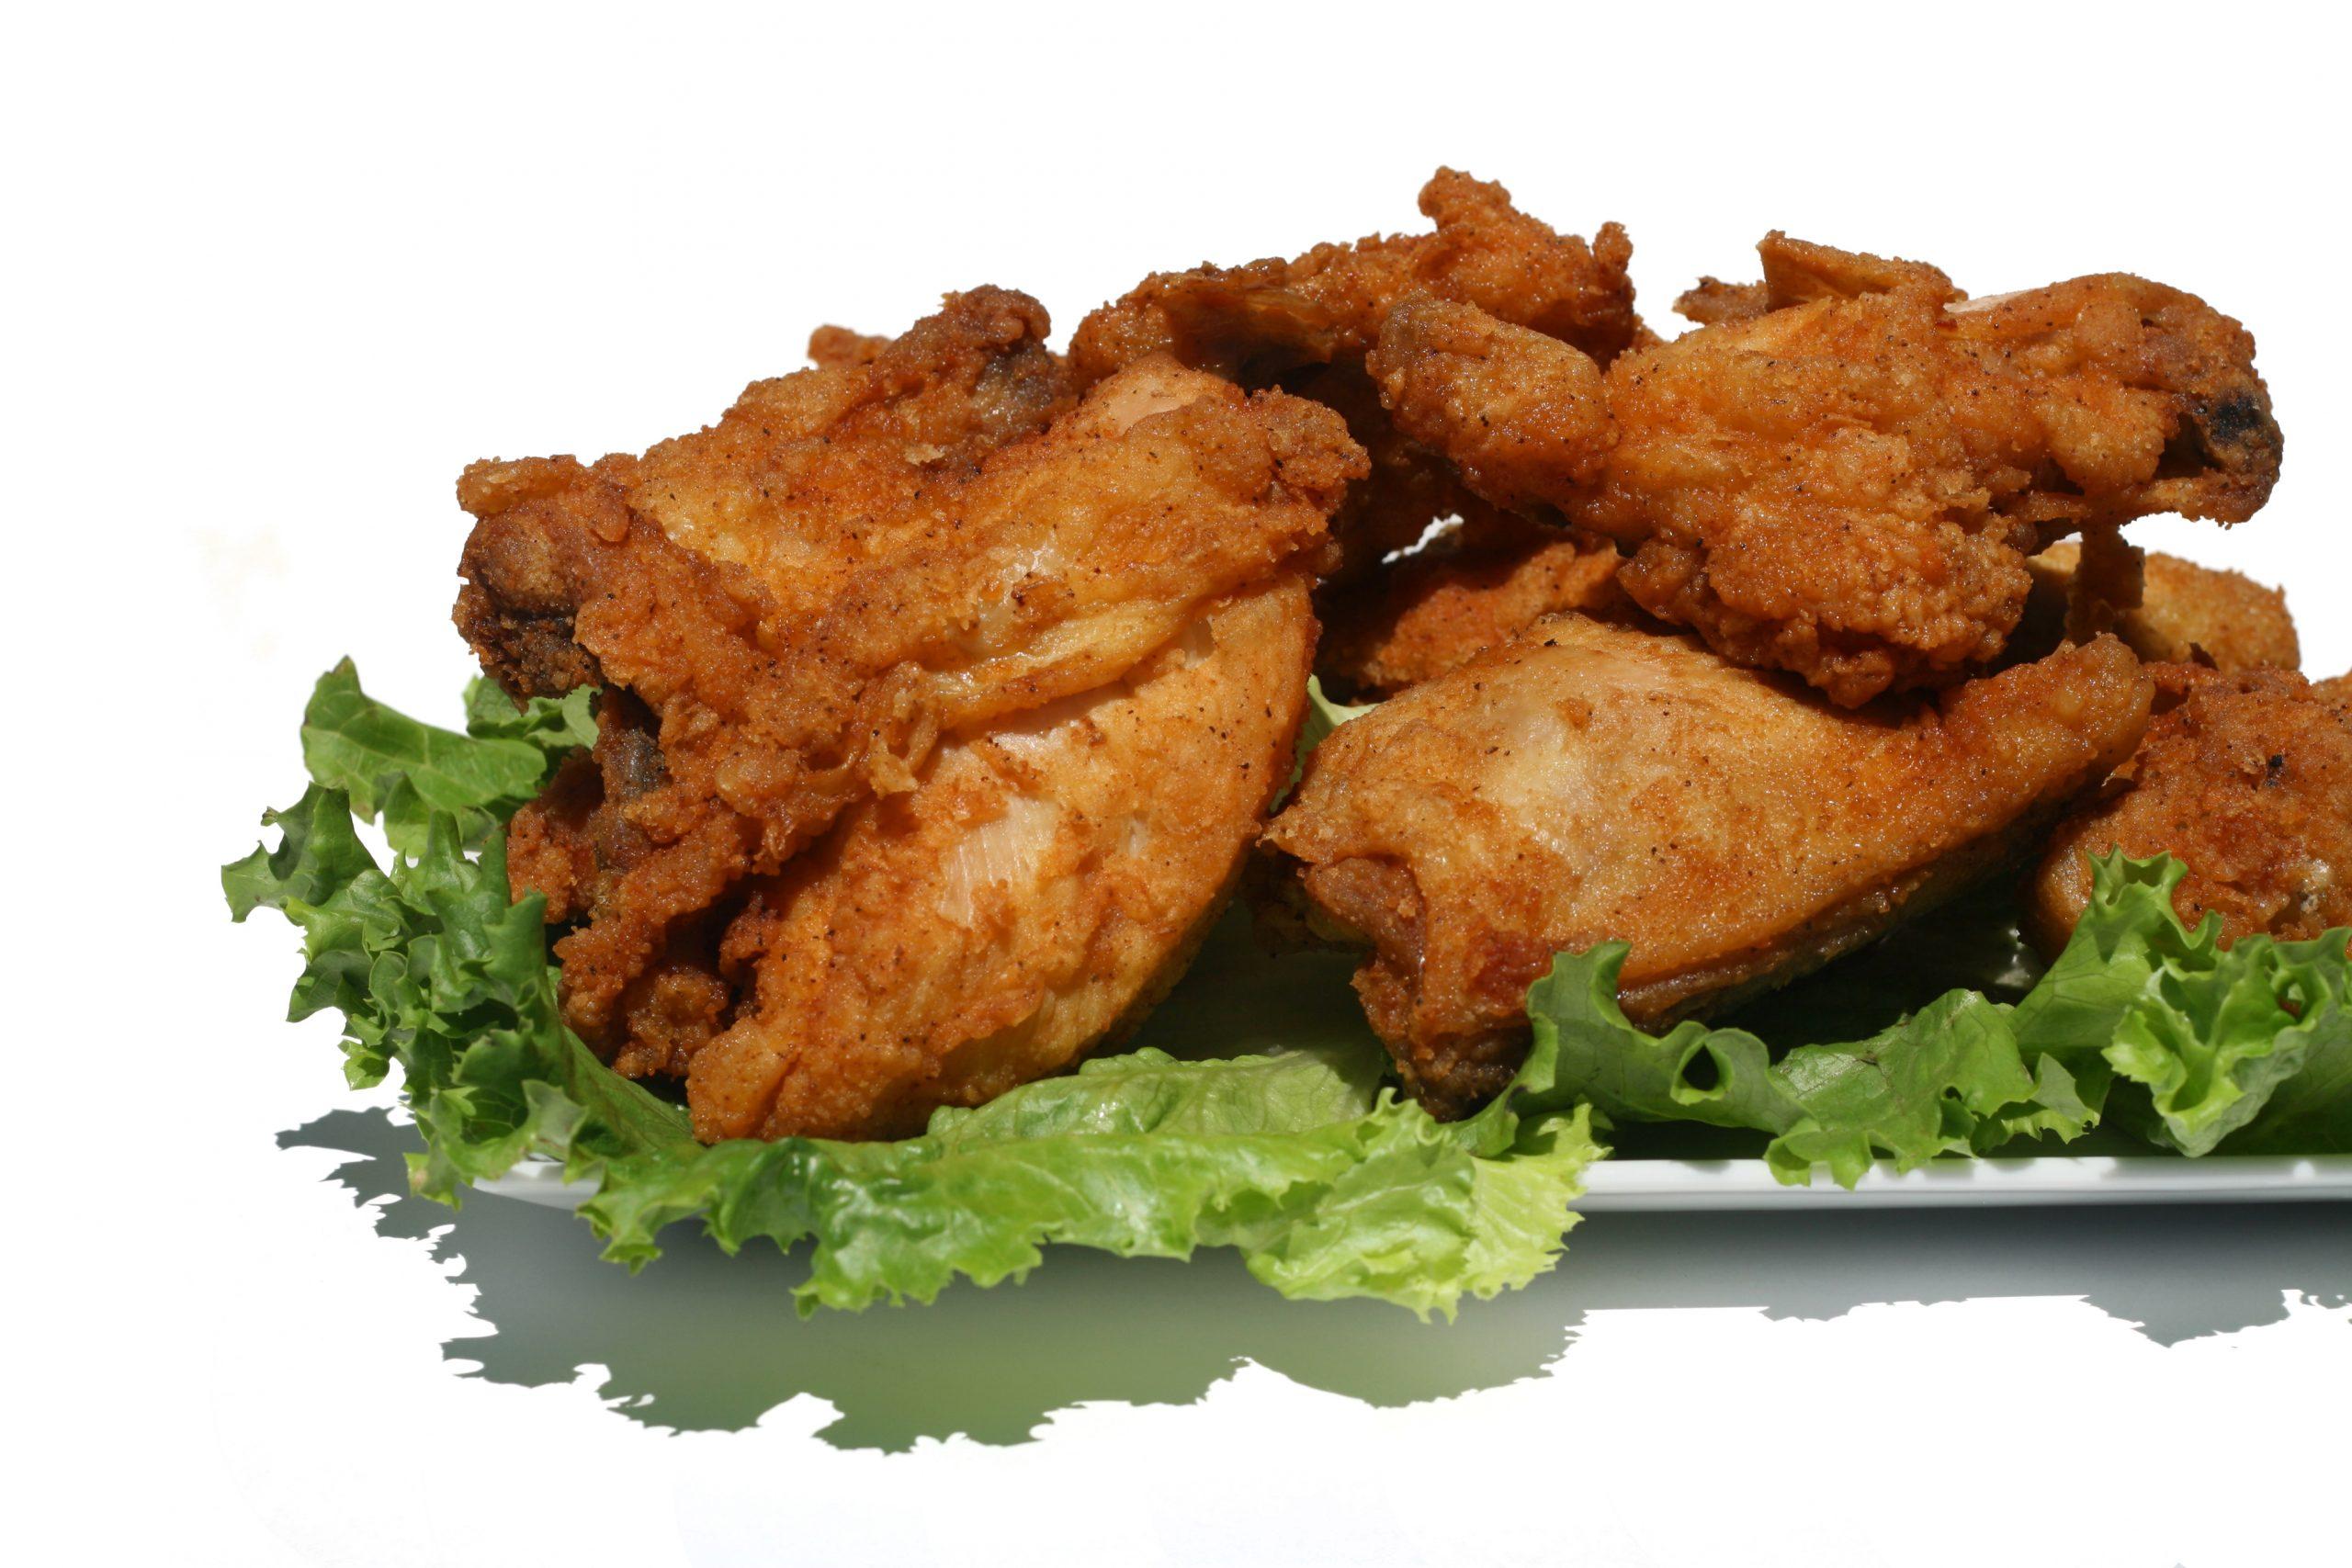 Keto Southern Fried Chicken